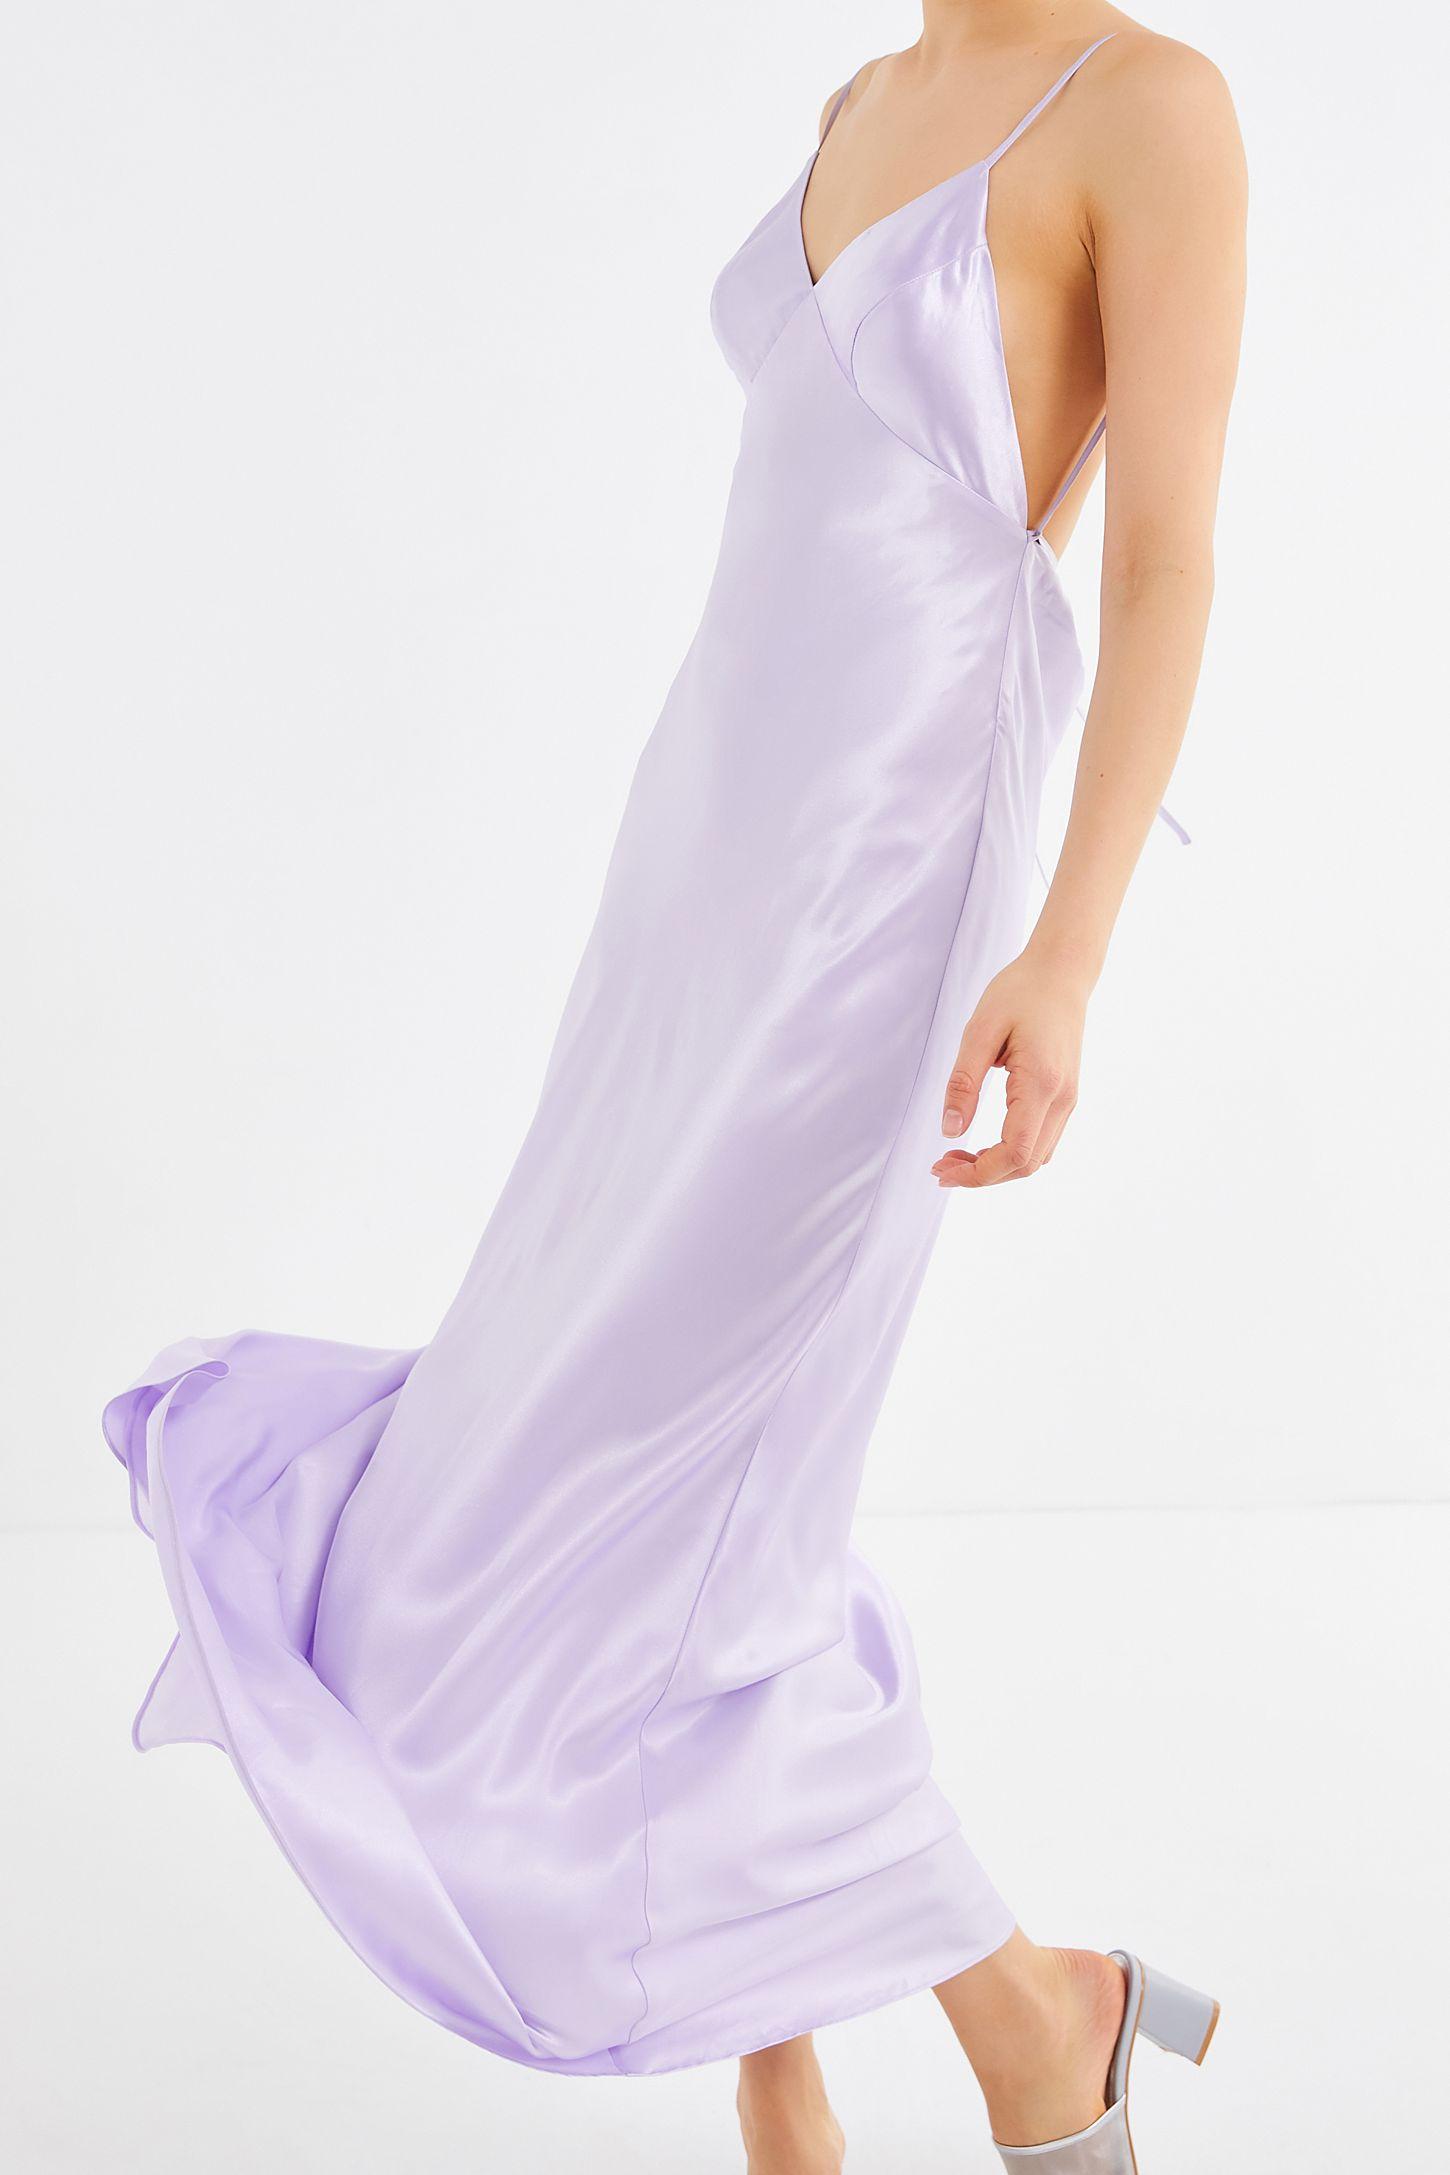 39227118aad Slide View  5  UO Romi Open-Back Maxi Slip Dress